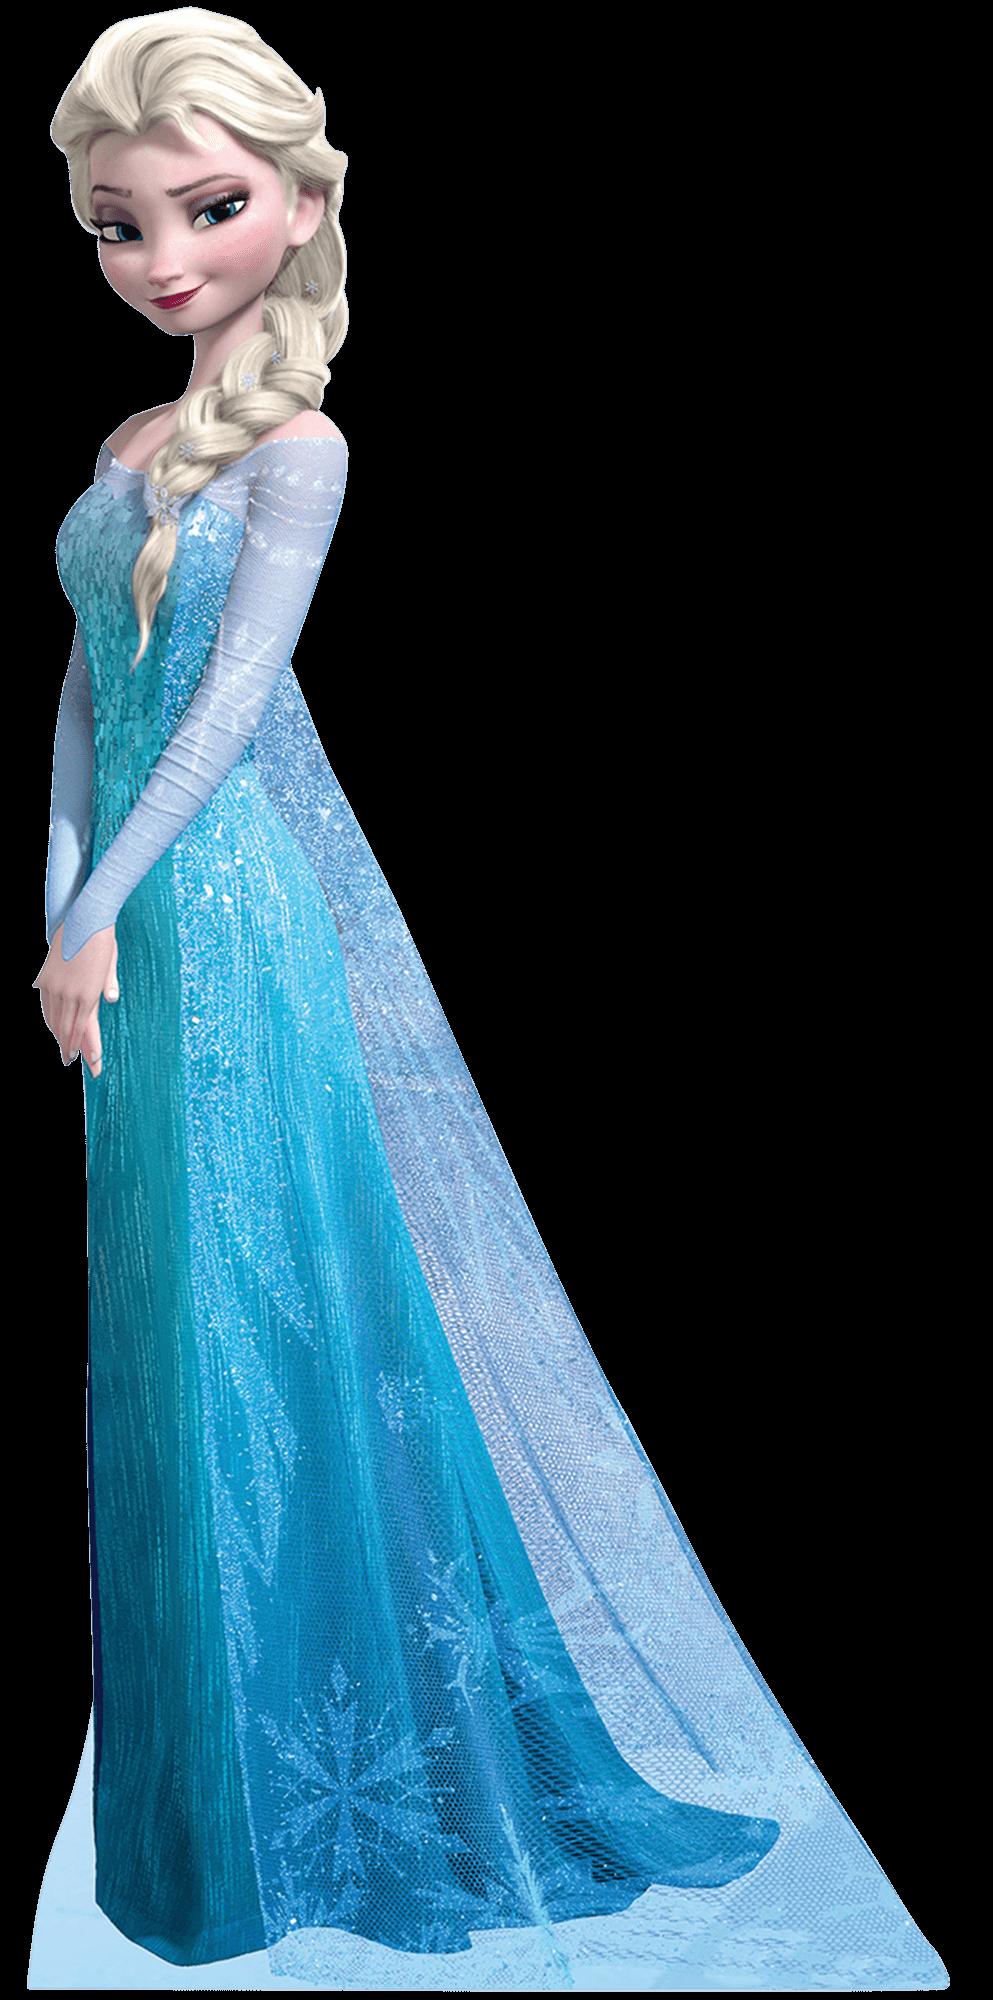 Elsa Frozen PNG Transparent Image